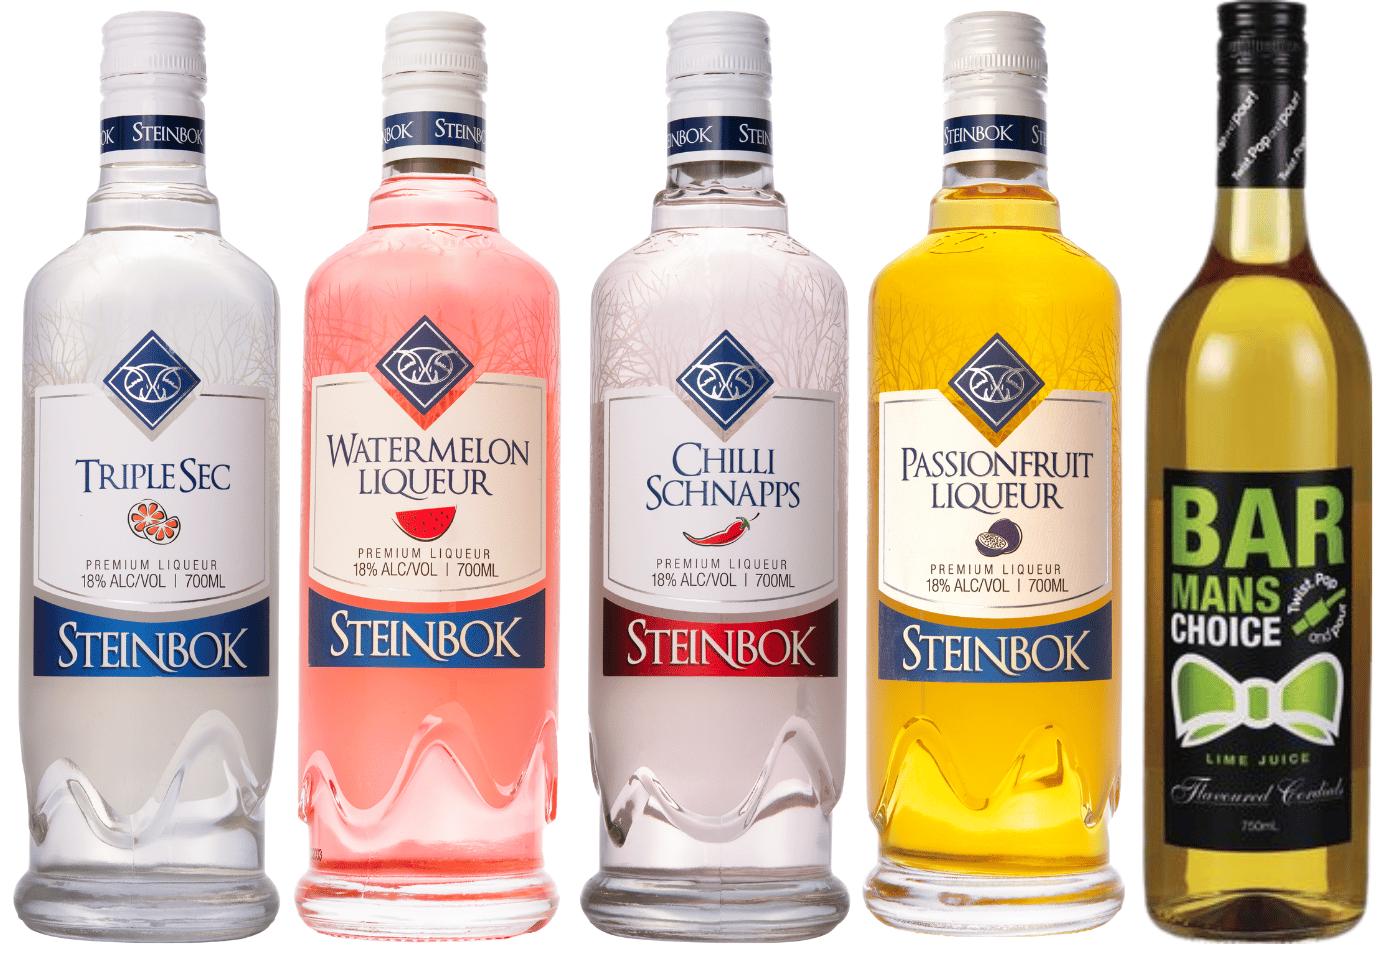 Steinbok Margarita Pack